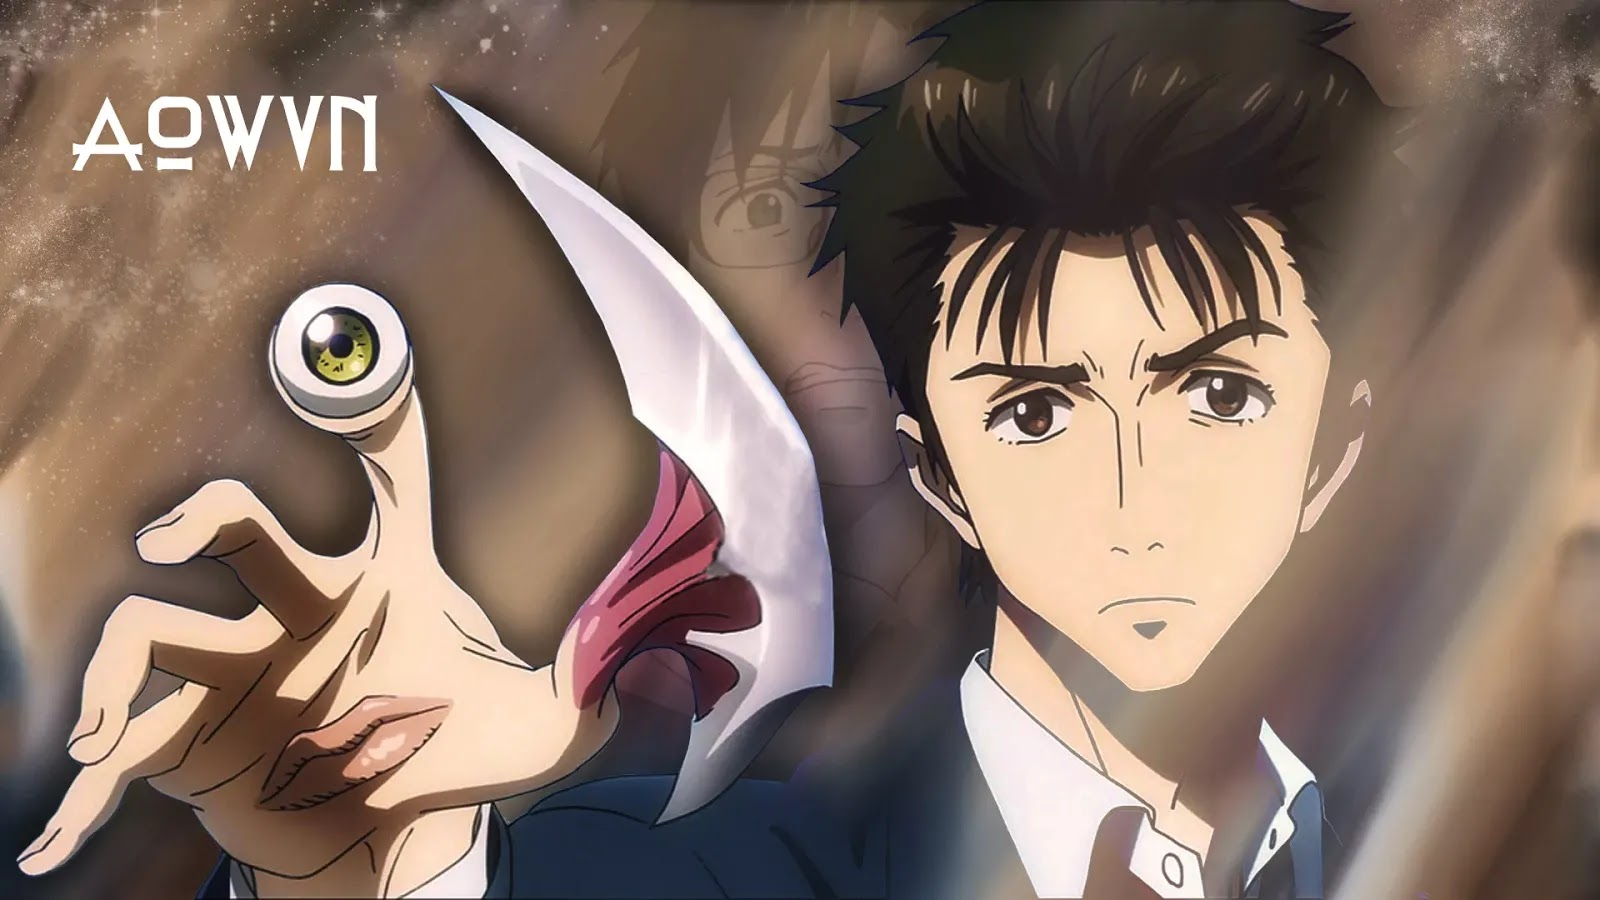 AowVN.org min%2B%25281%2529 - [ Anime 3gp Mp4 ] Kiseijuu: Sei no Kakuritsu - Kí Sinh Thú | Vietsub - Tuyệt Hay